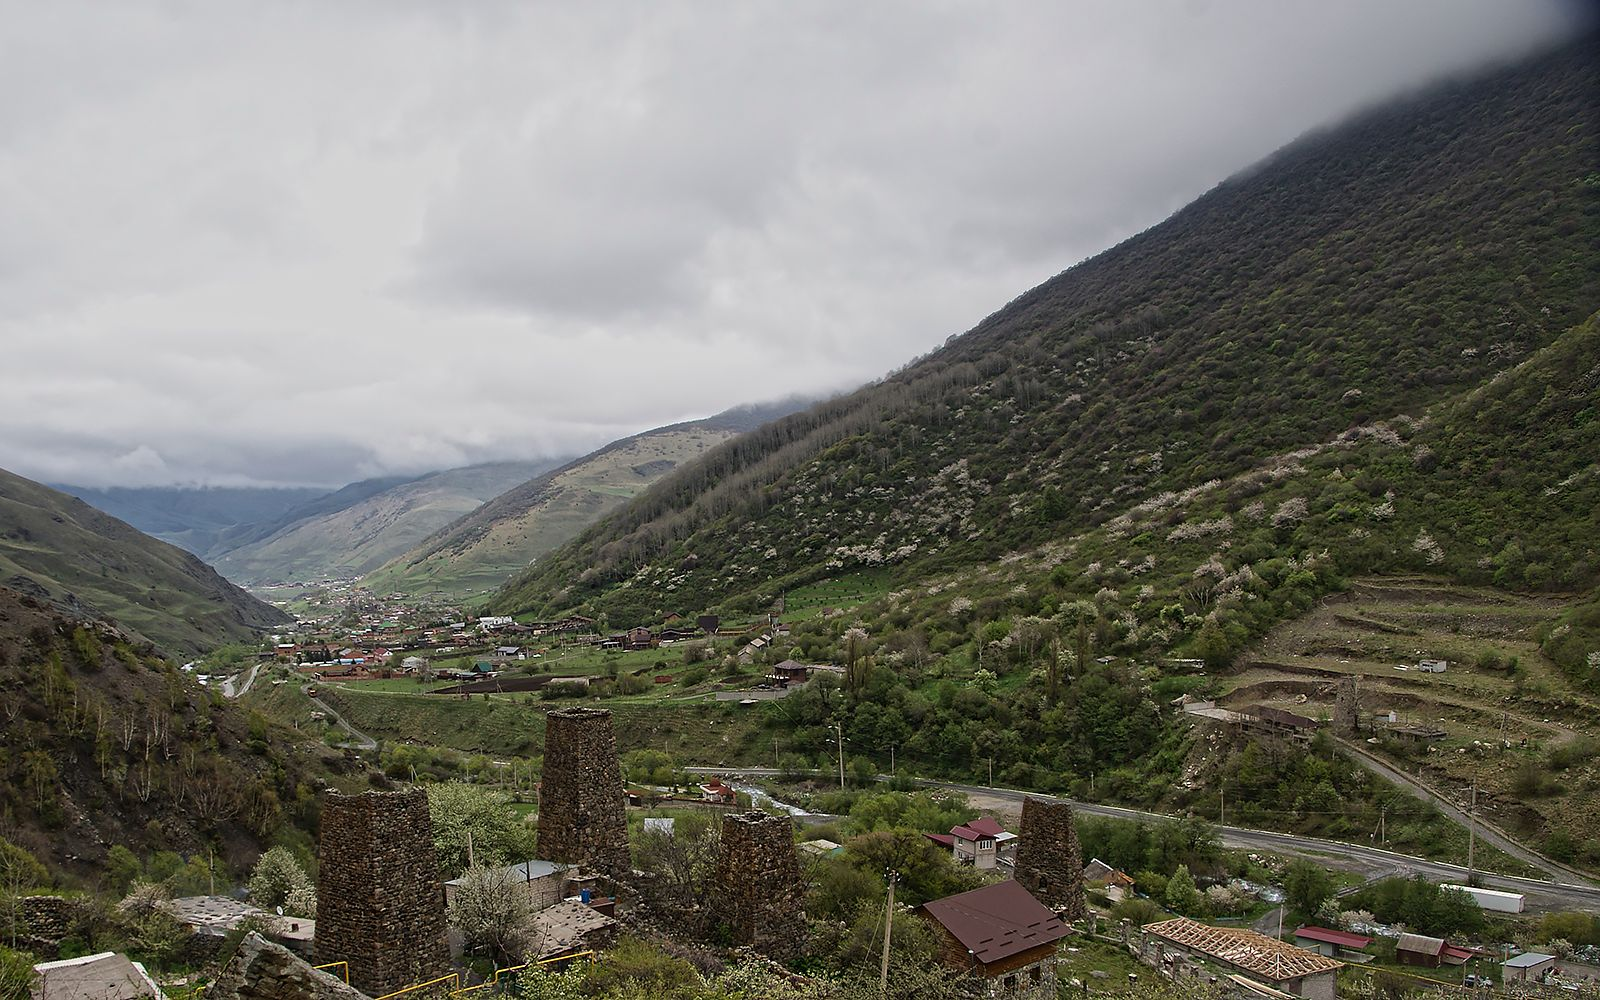 Харисджин Харисджин начало подъема к Архонскому перевалу